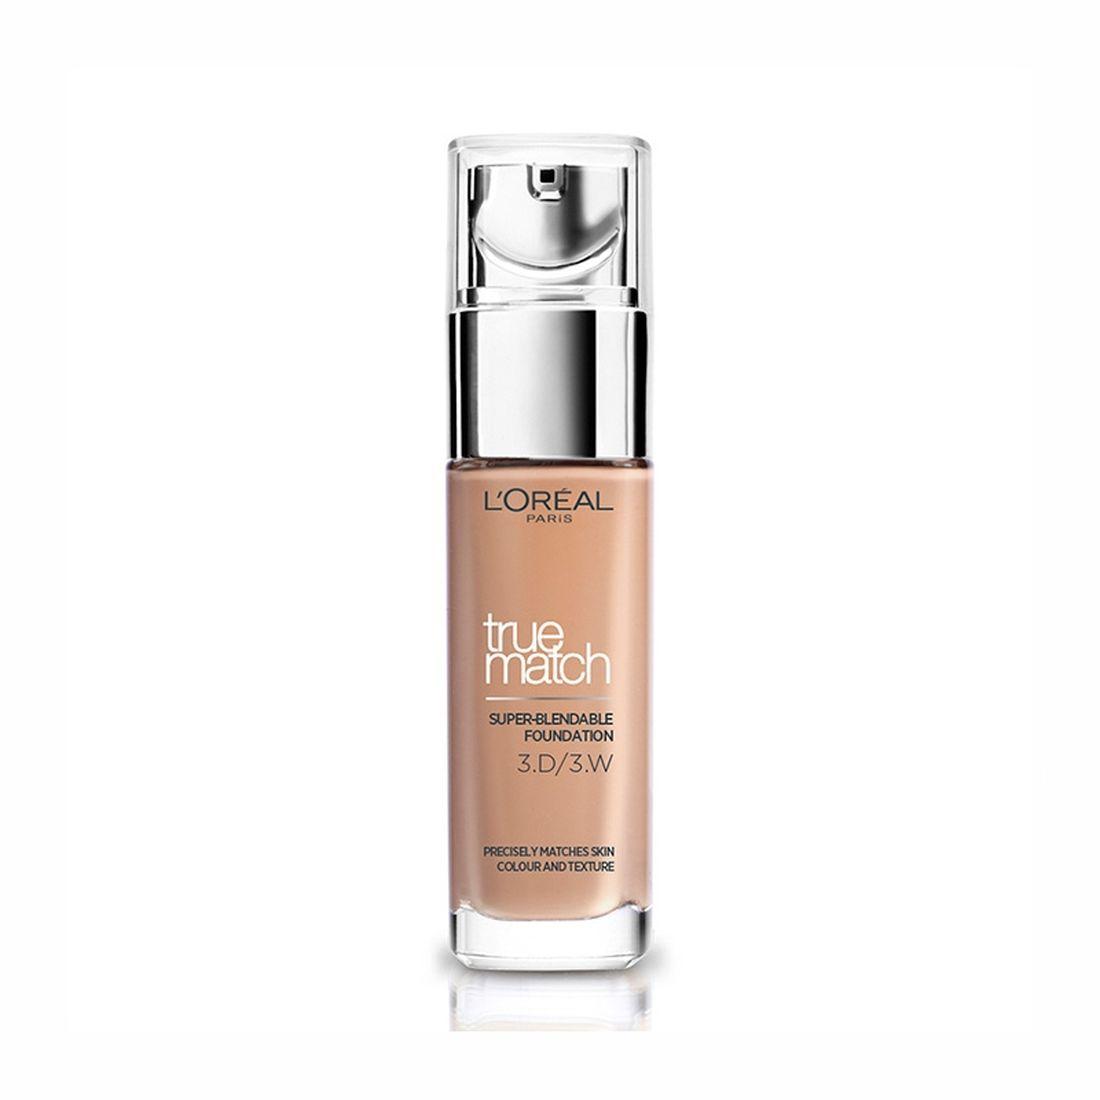 L'Oréal True Match Foundation 30ml 3D3W Golden Beige